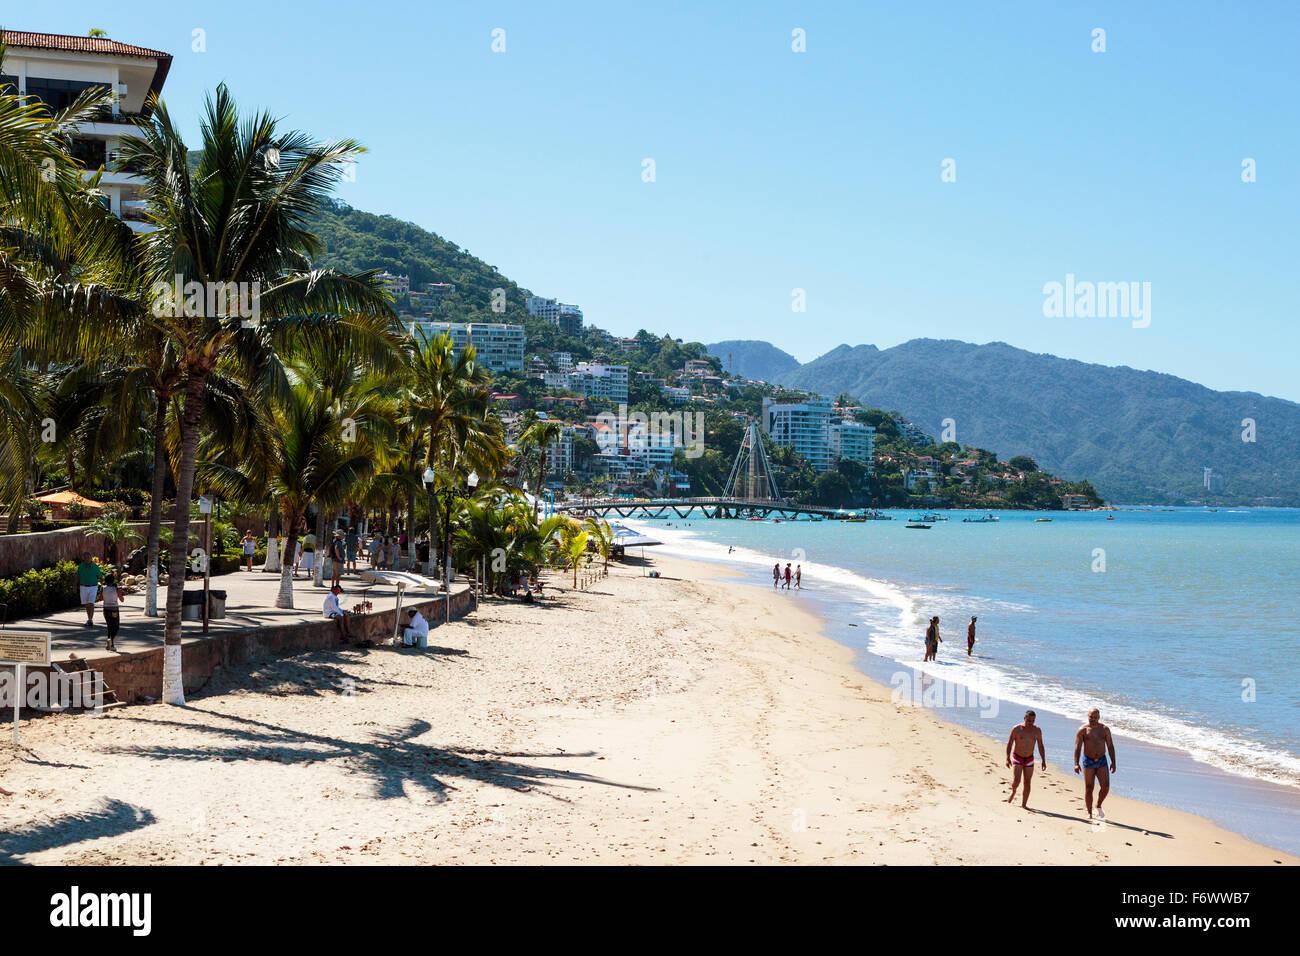 Beach at Zona Romantica, old town of Puerto Vallarta, Mexico Stock Photo